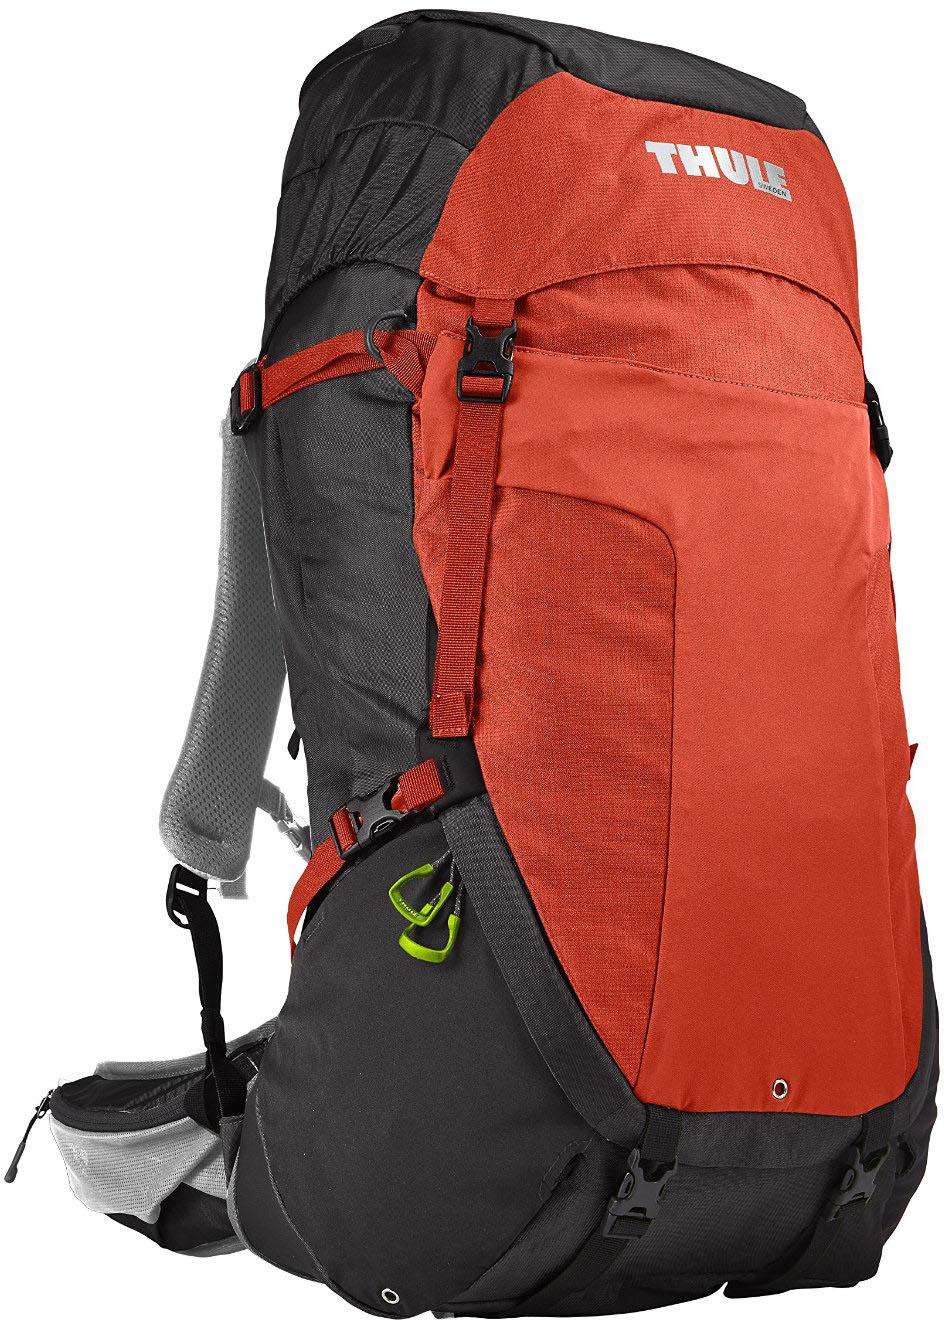 Men's Hiking Pack